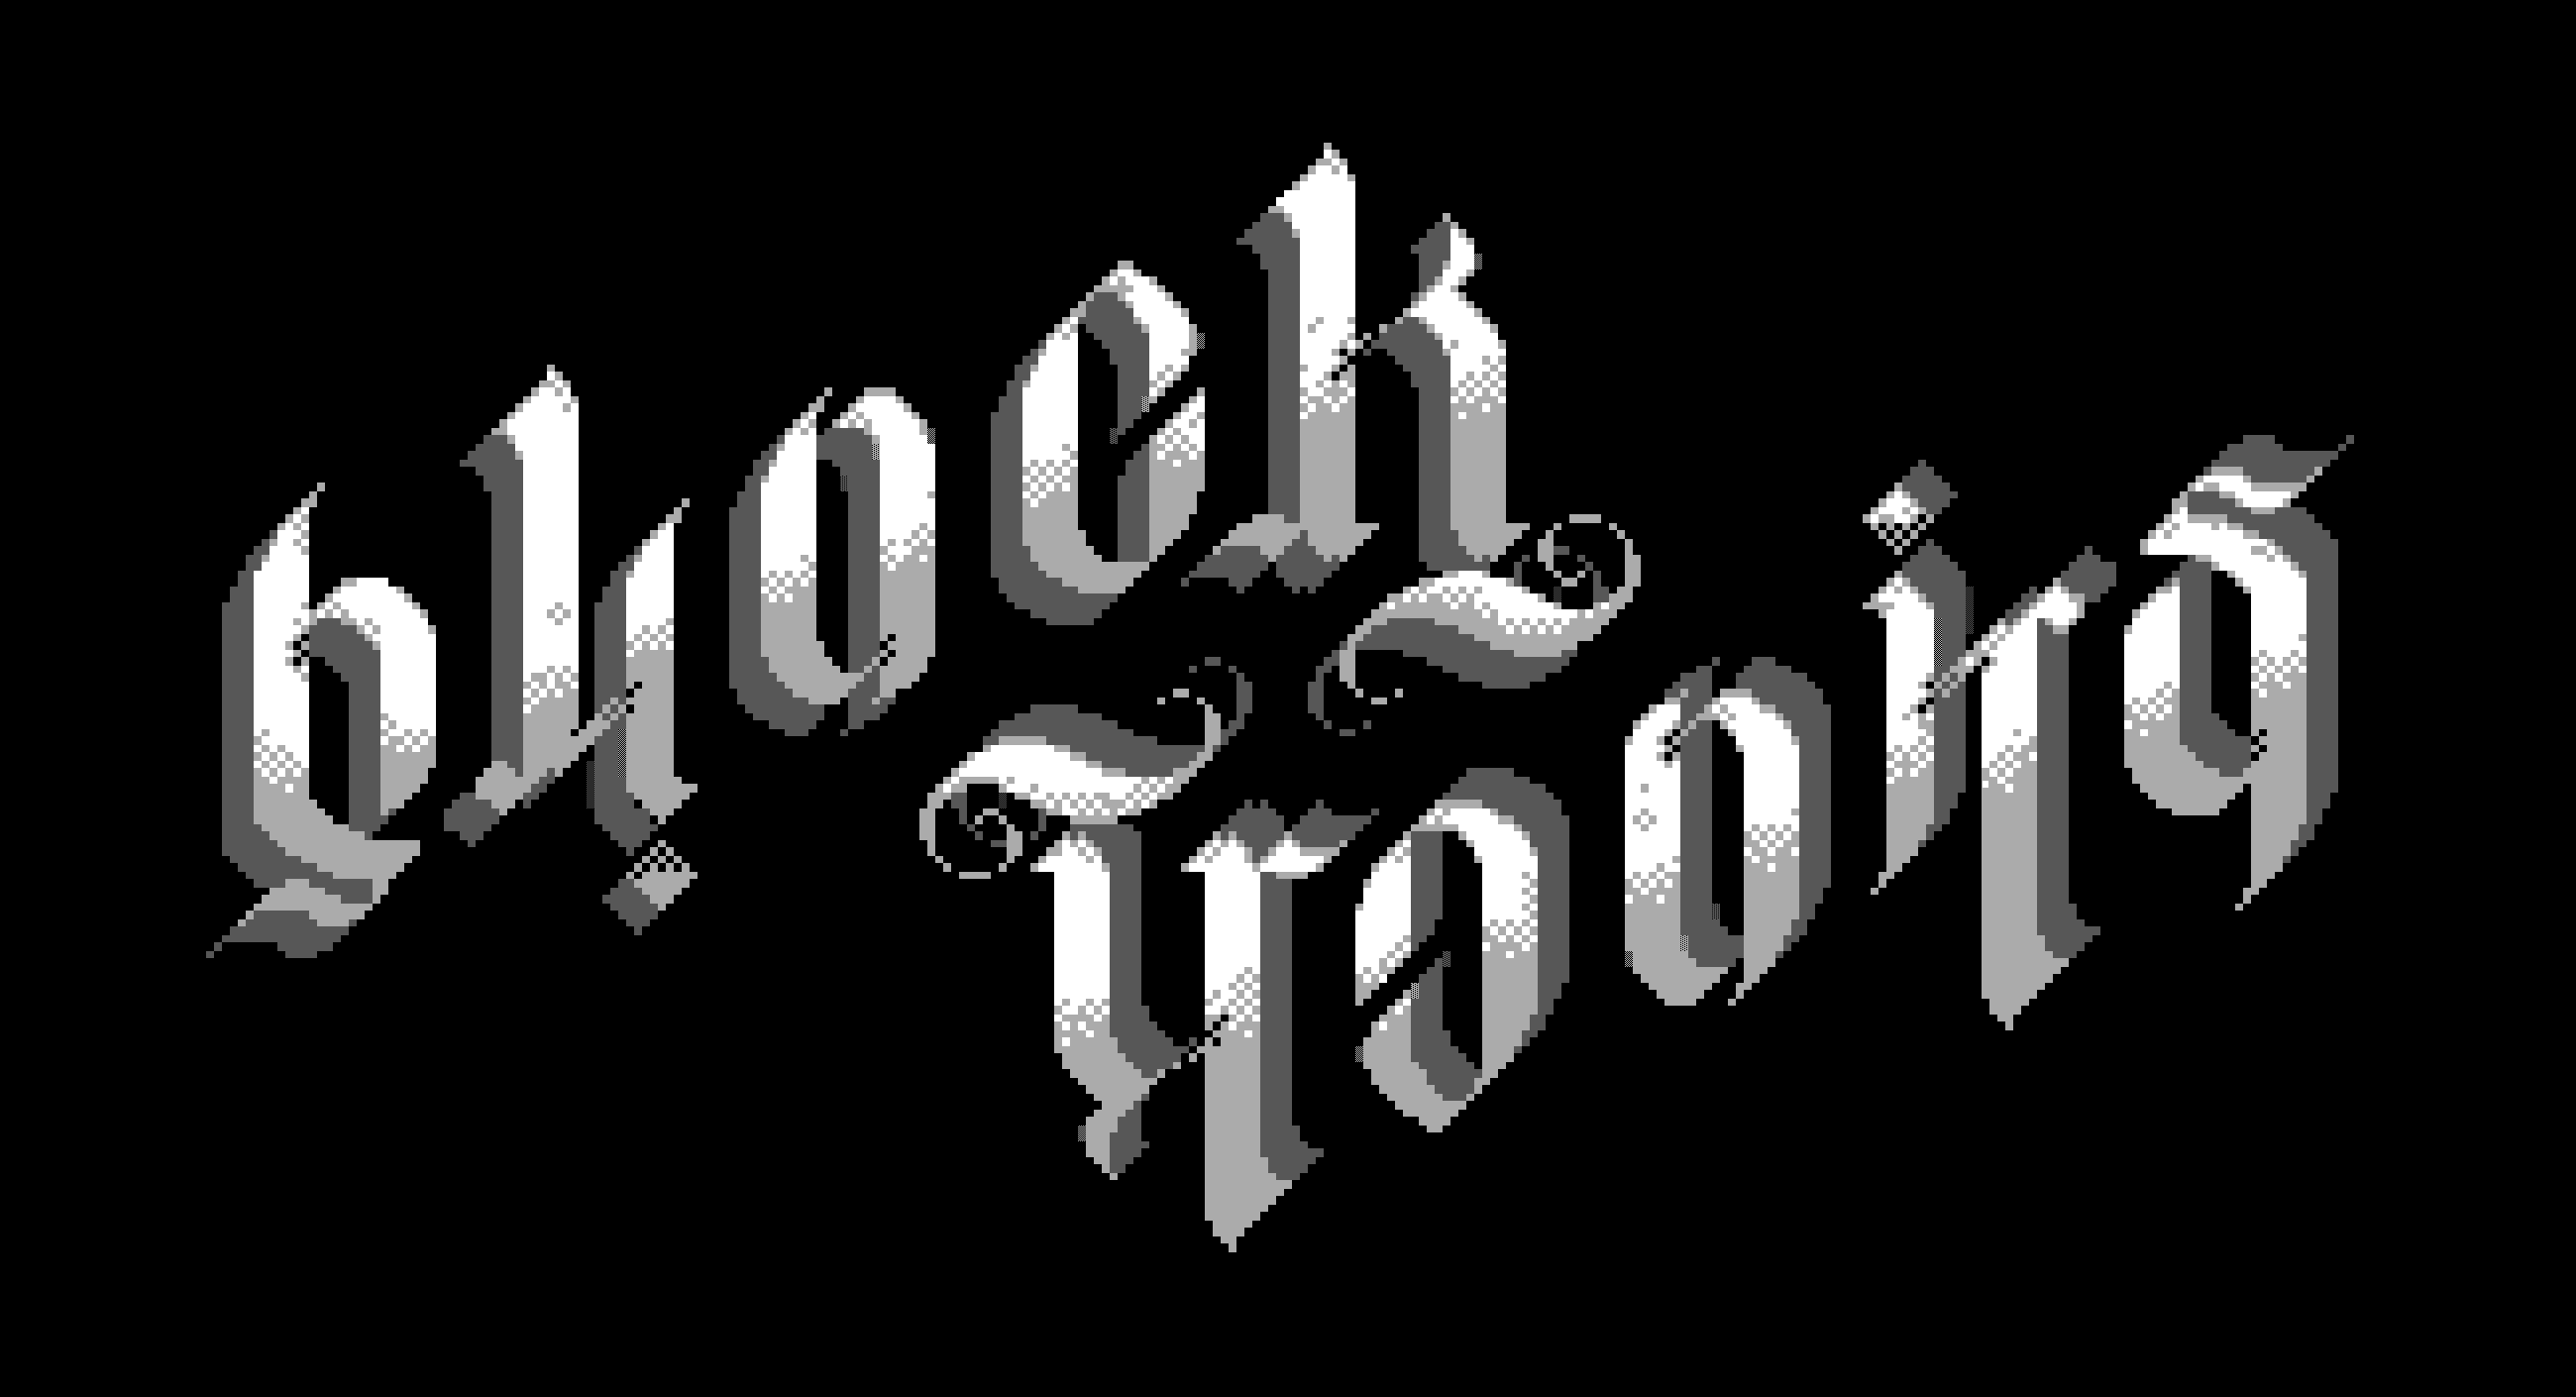 Blocktronics Ambigram